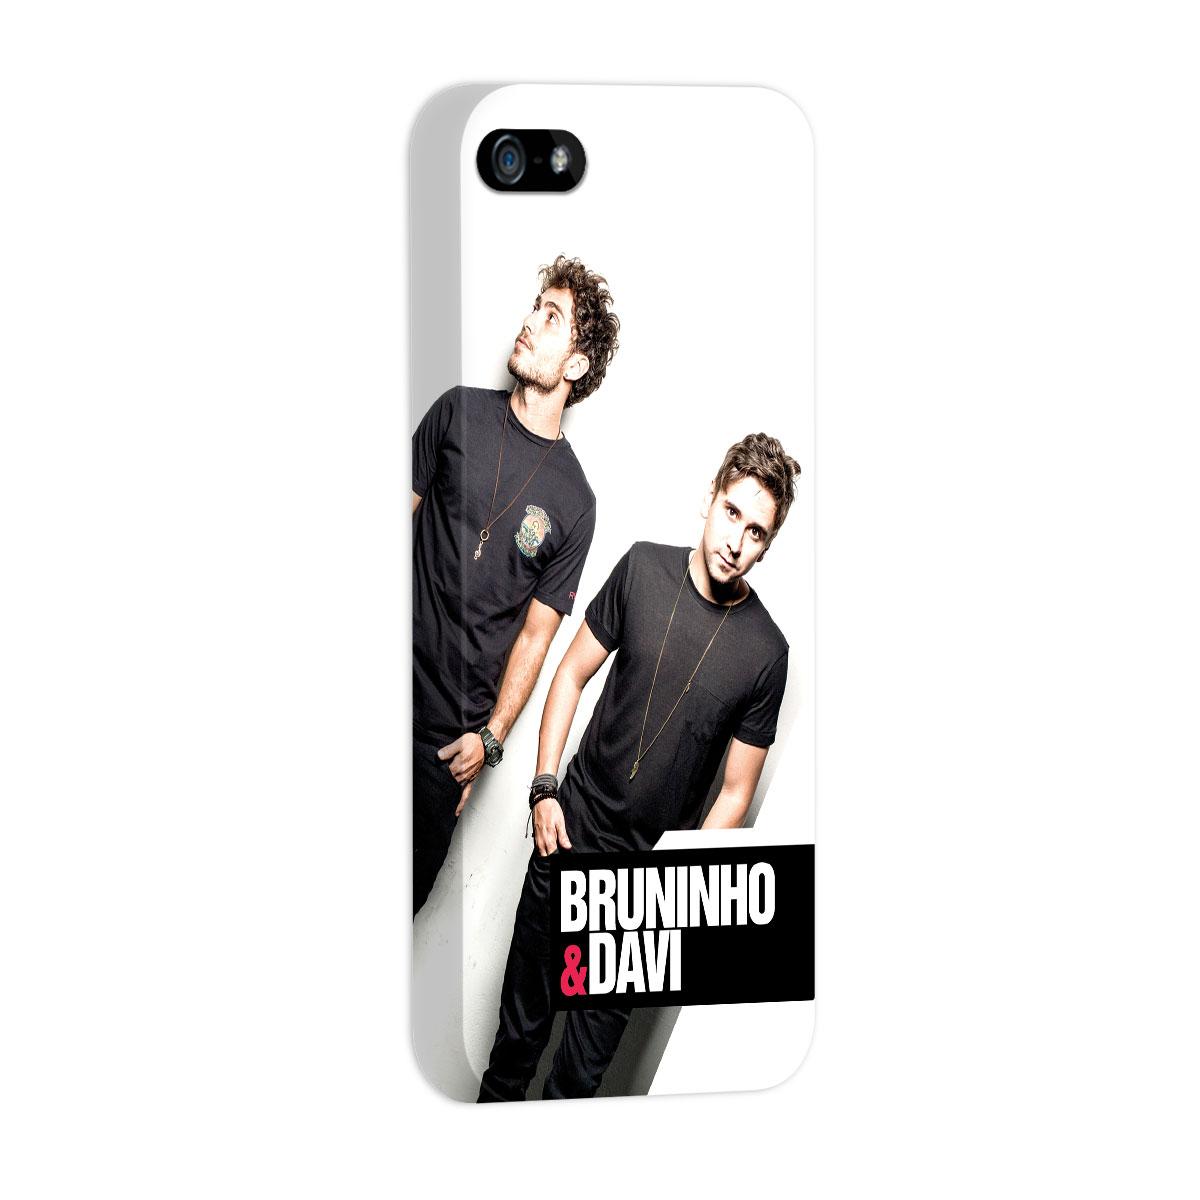 Capa para iPhone 5/5S Bruninho & Davi Foto